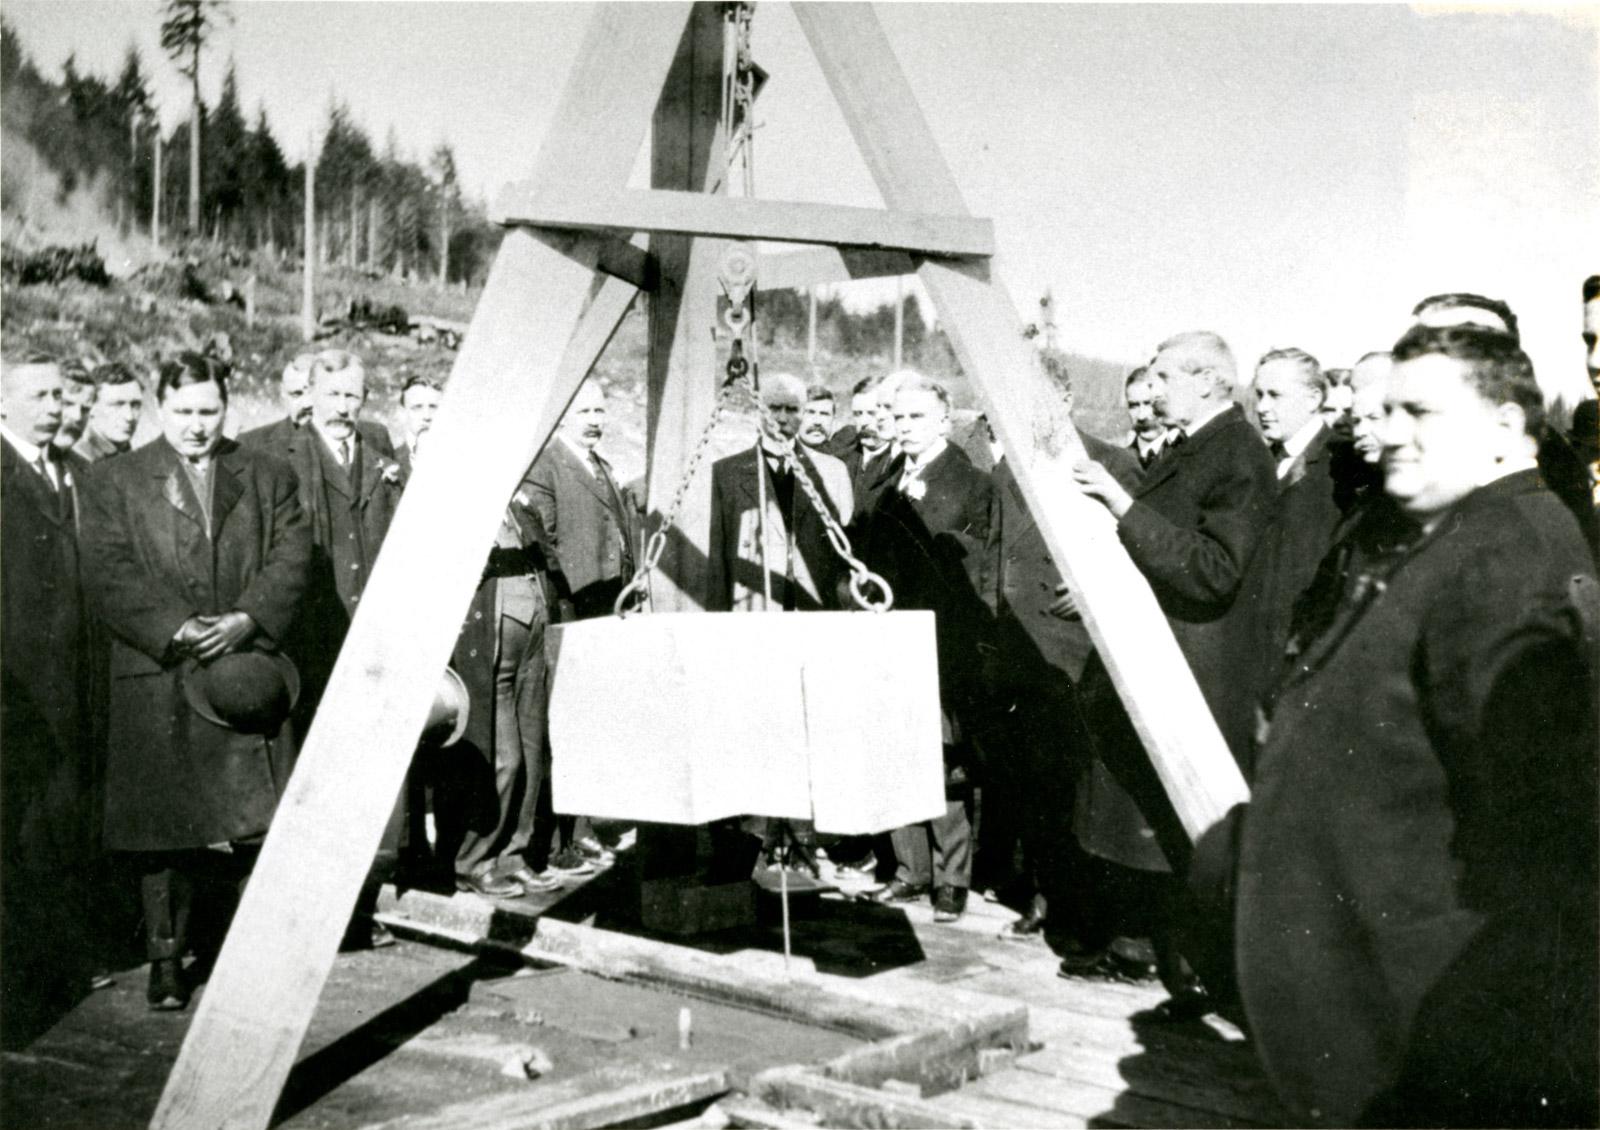 Lieutenant Governor Thomas Patterson lays first corner stone at Essondale, 1908.